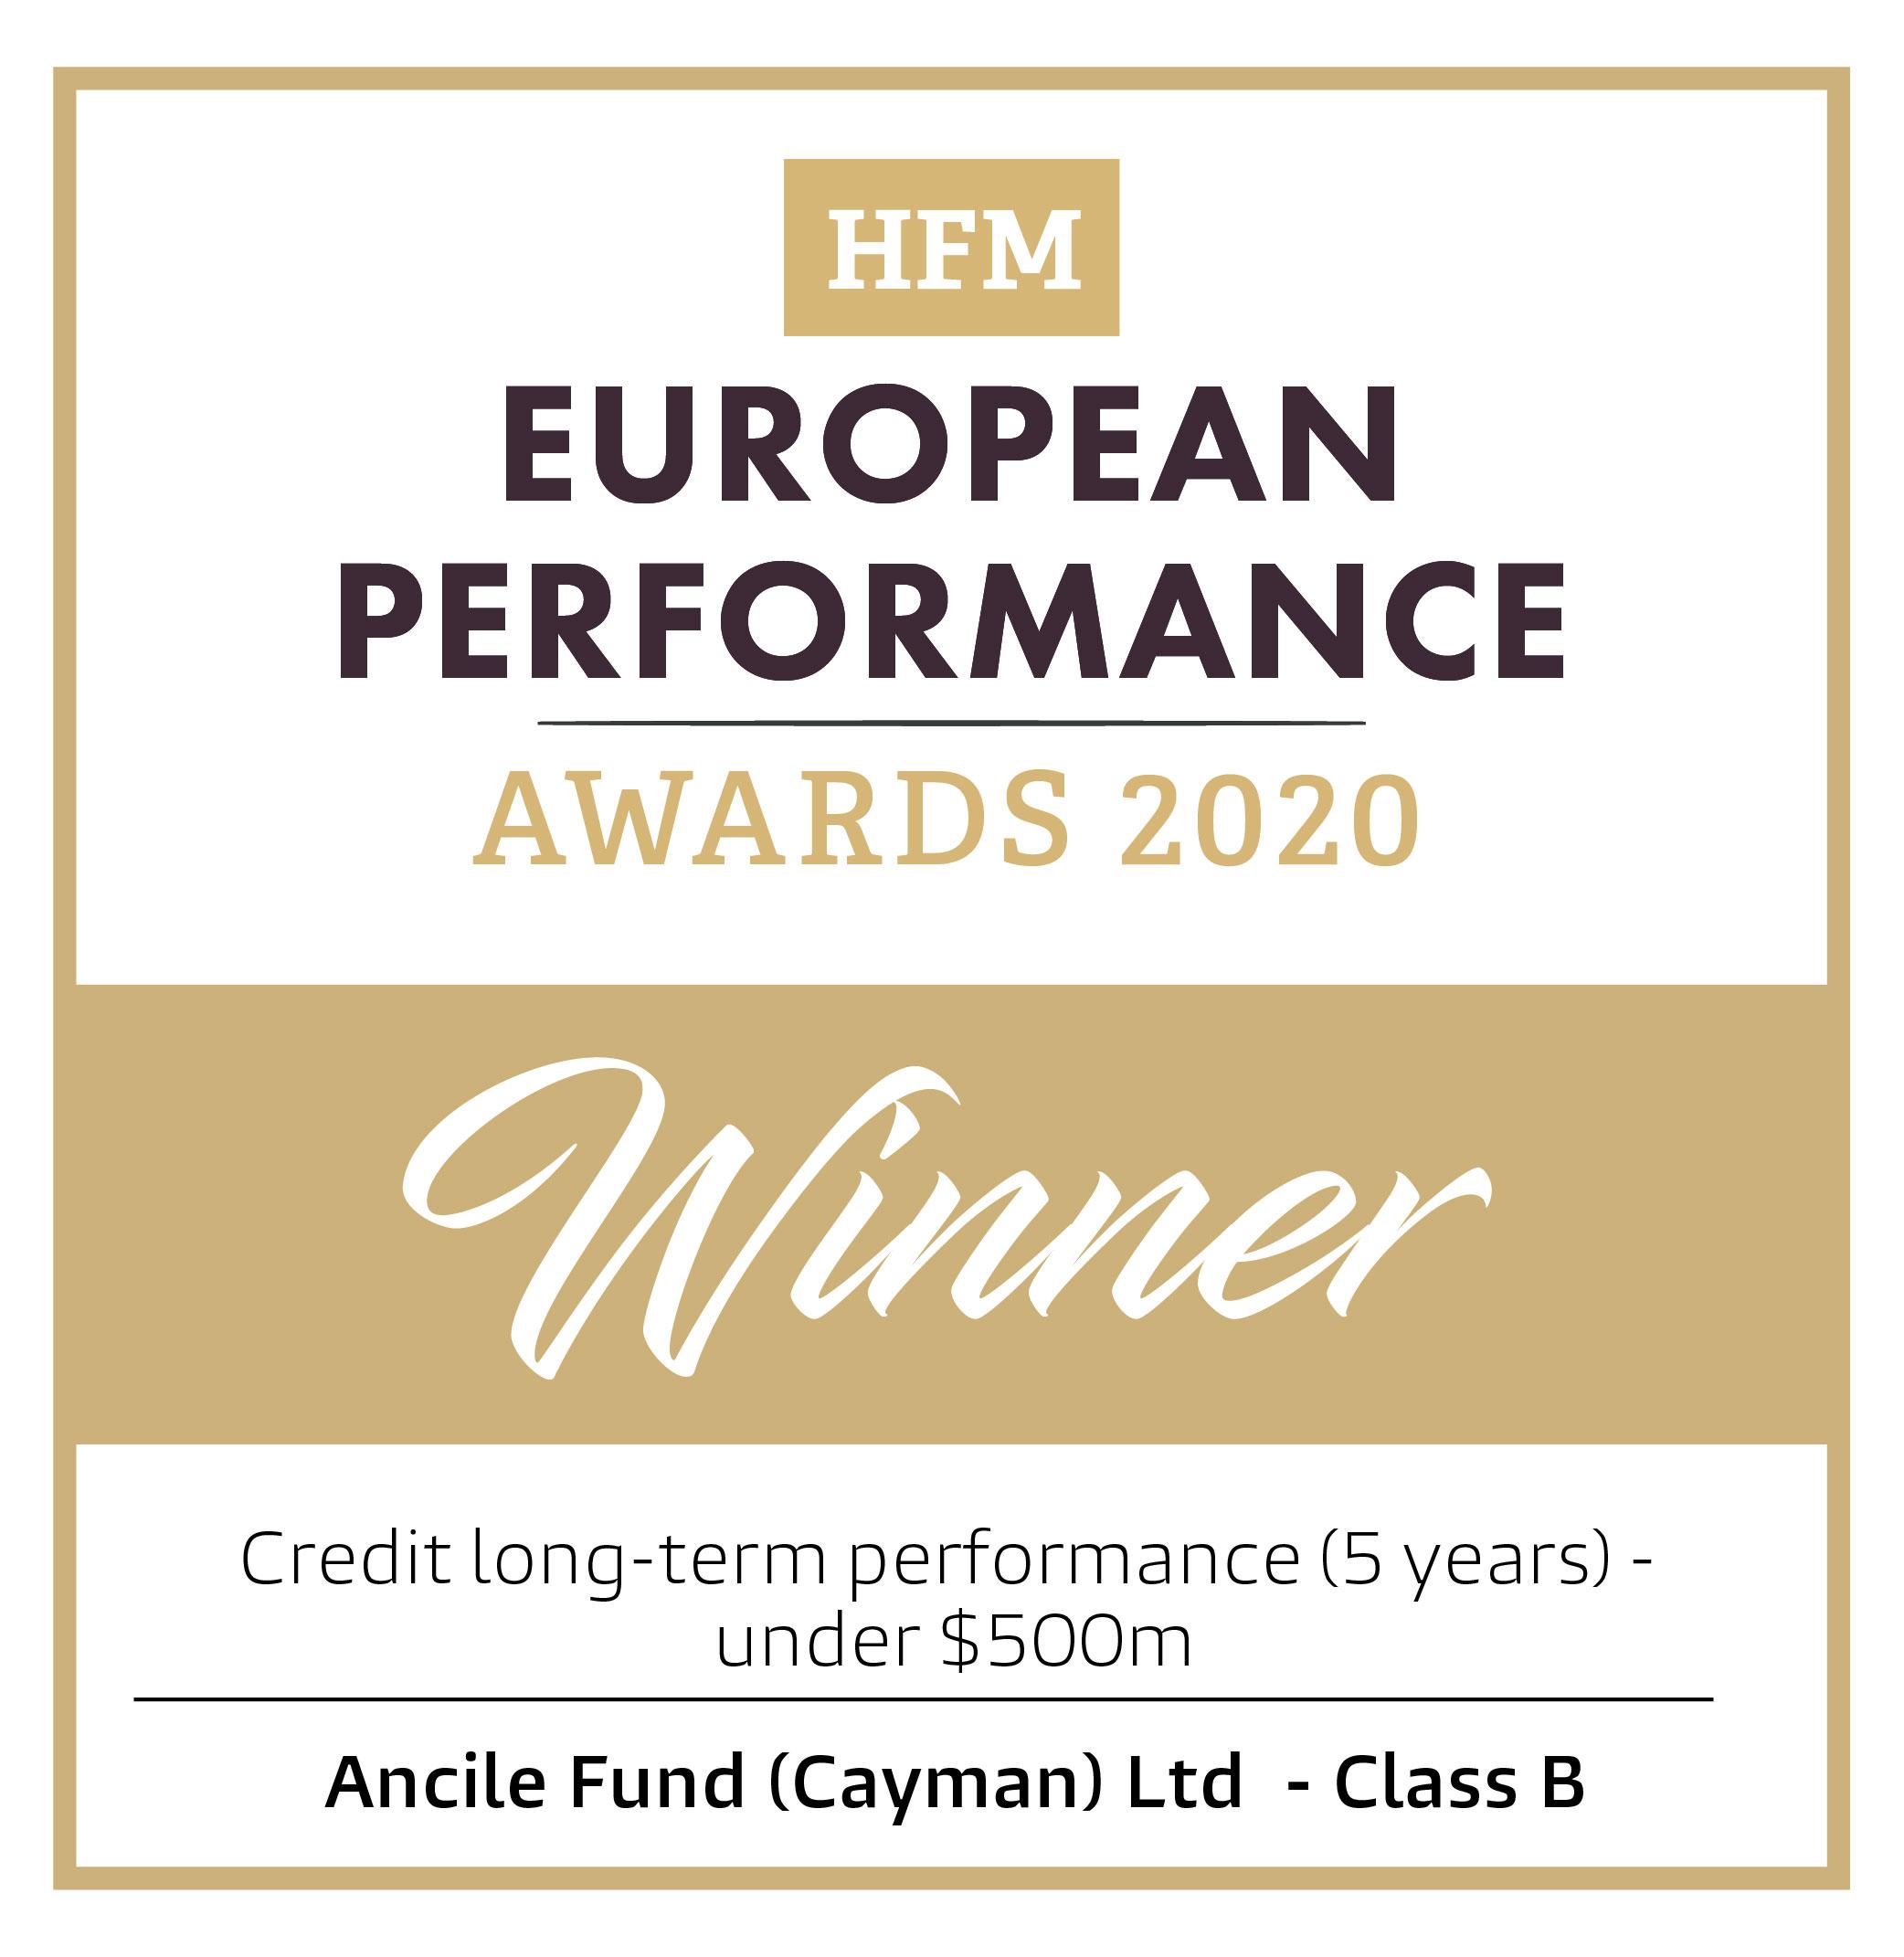 HFM EuropeanPerformanceAwards_WinnerLogos_Winner_ancile